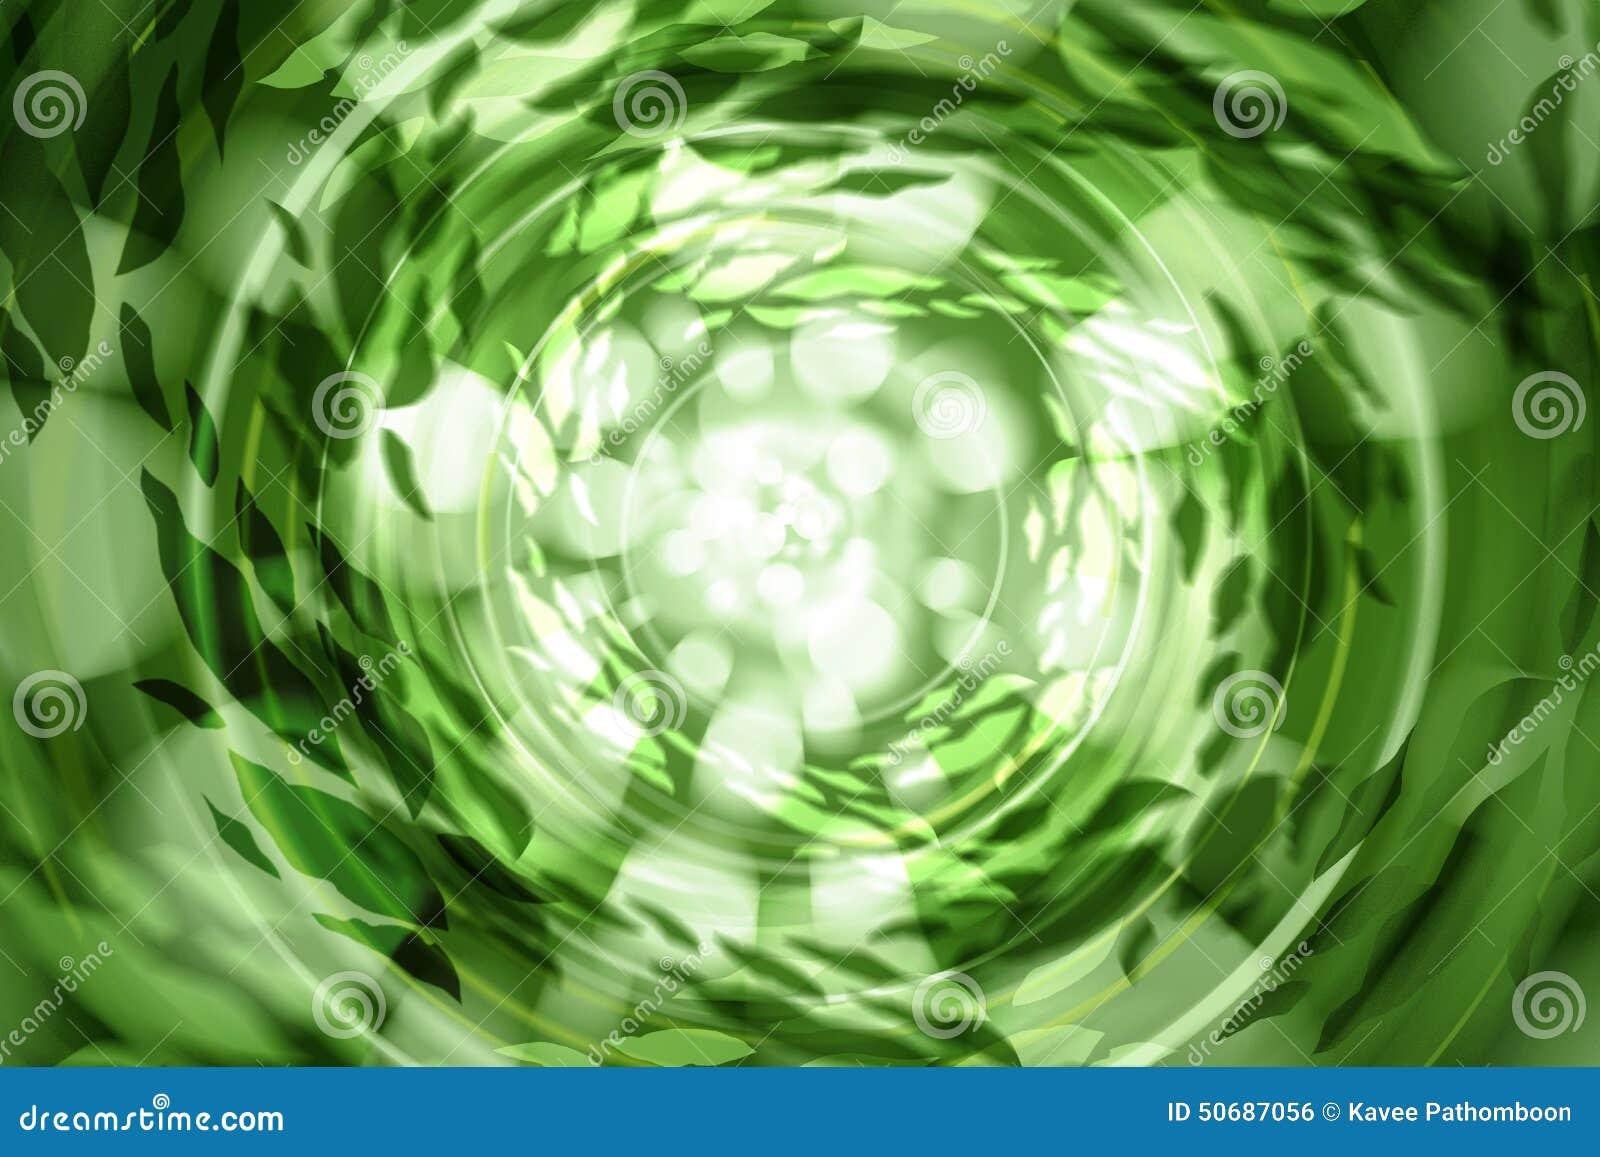 Download Defocused绿色抽象轻的背景 库存例证. 插画 包括有 绿色, 小点, 增长, 冷静, 抽象, 强光 - 50687056